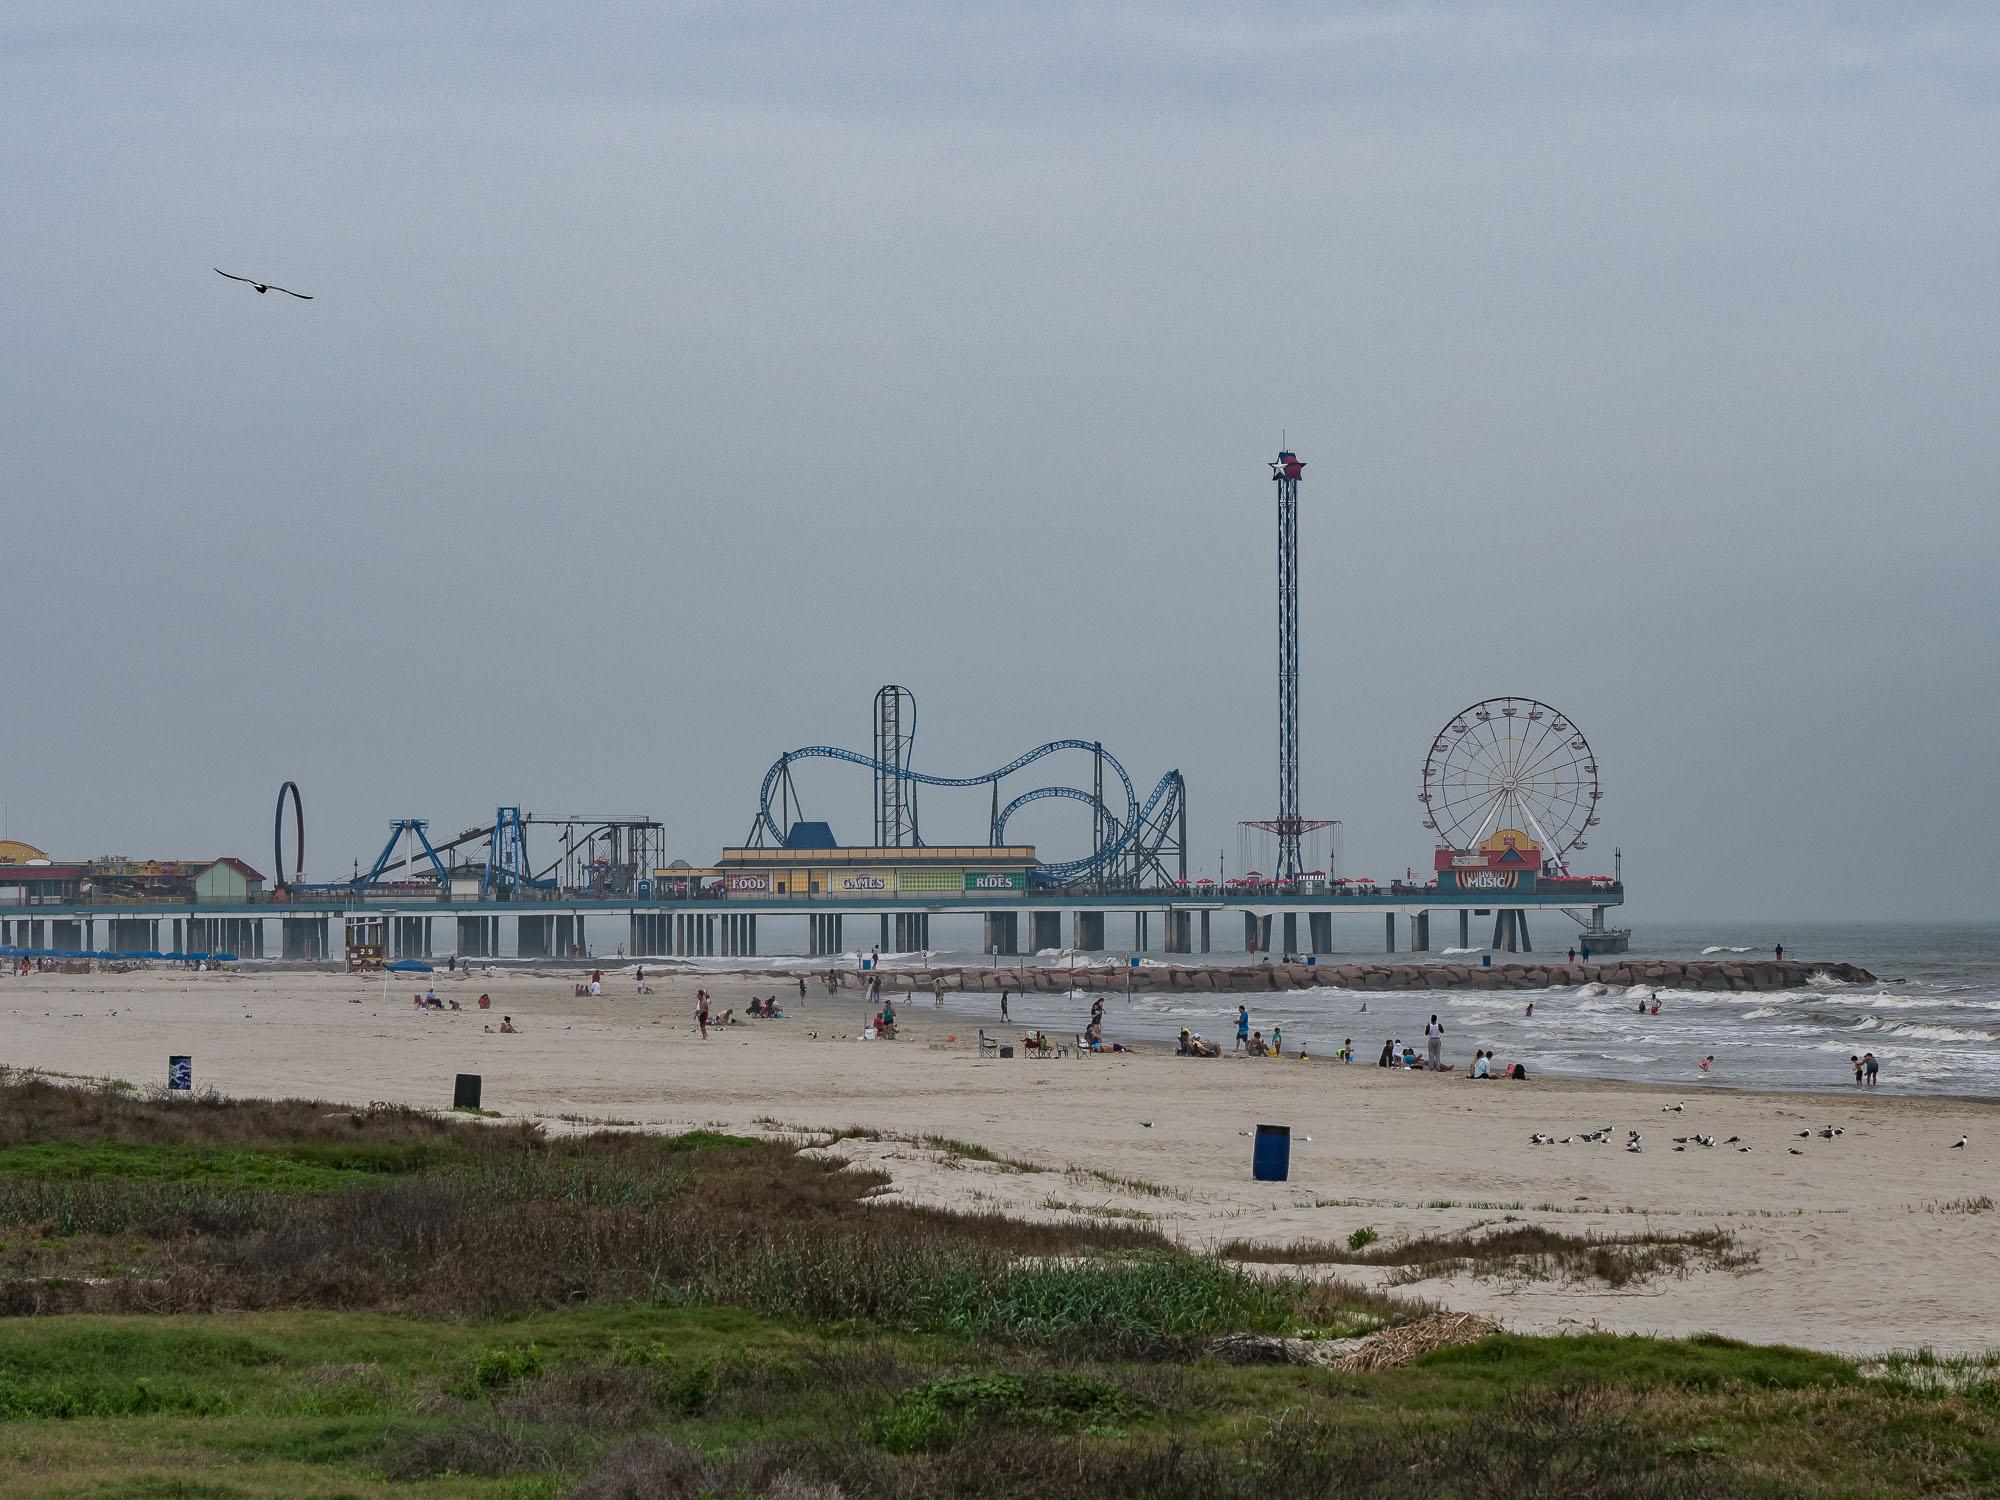 Galveston Beach